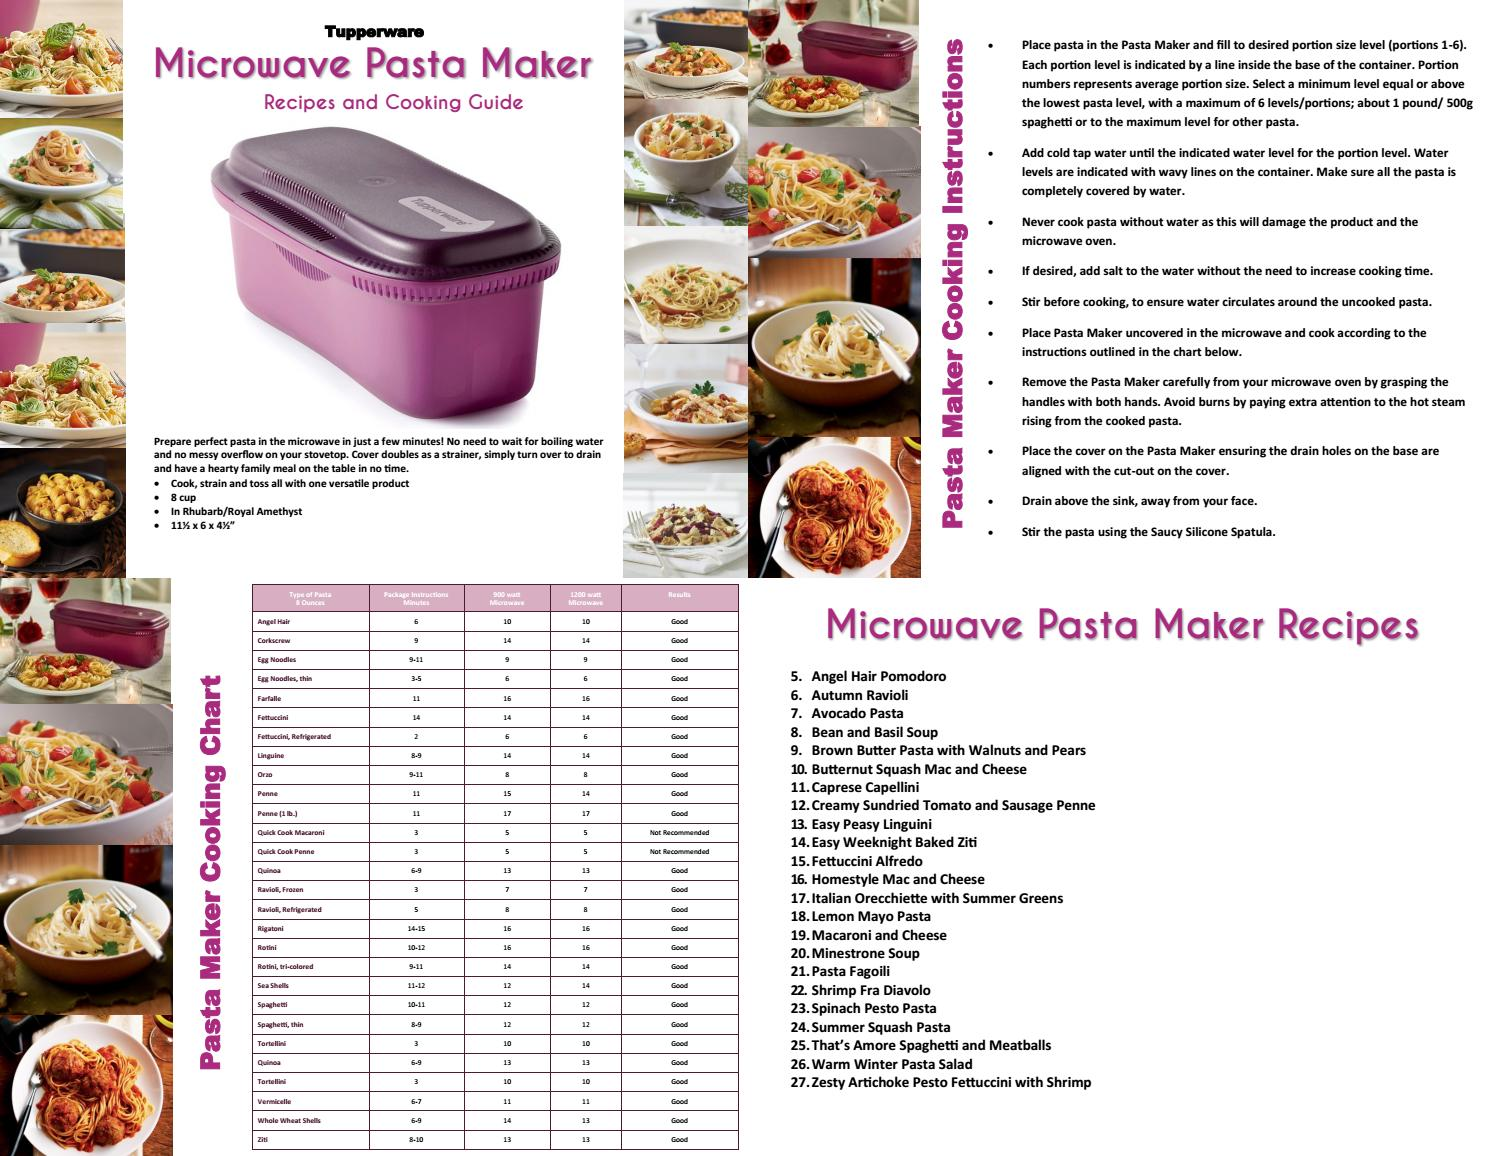 tupperware pasta maker recipes and